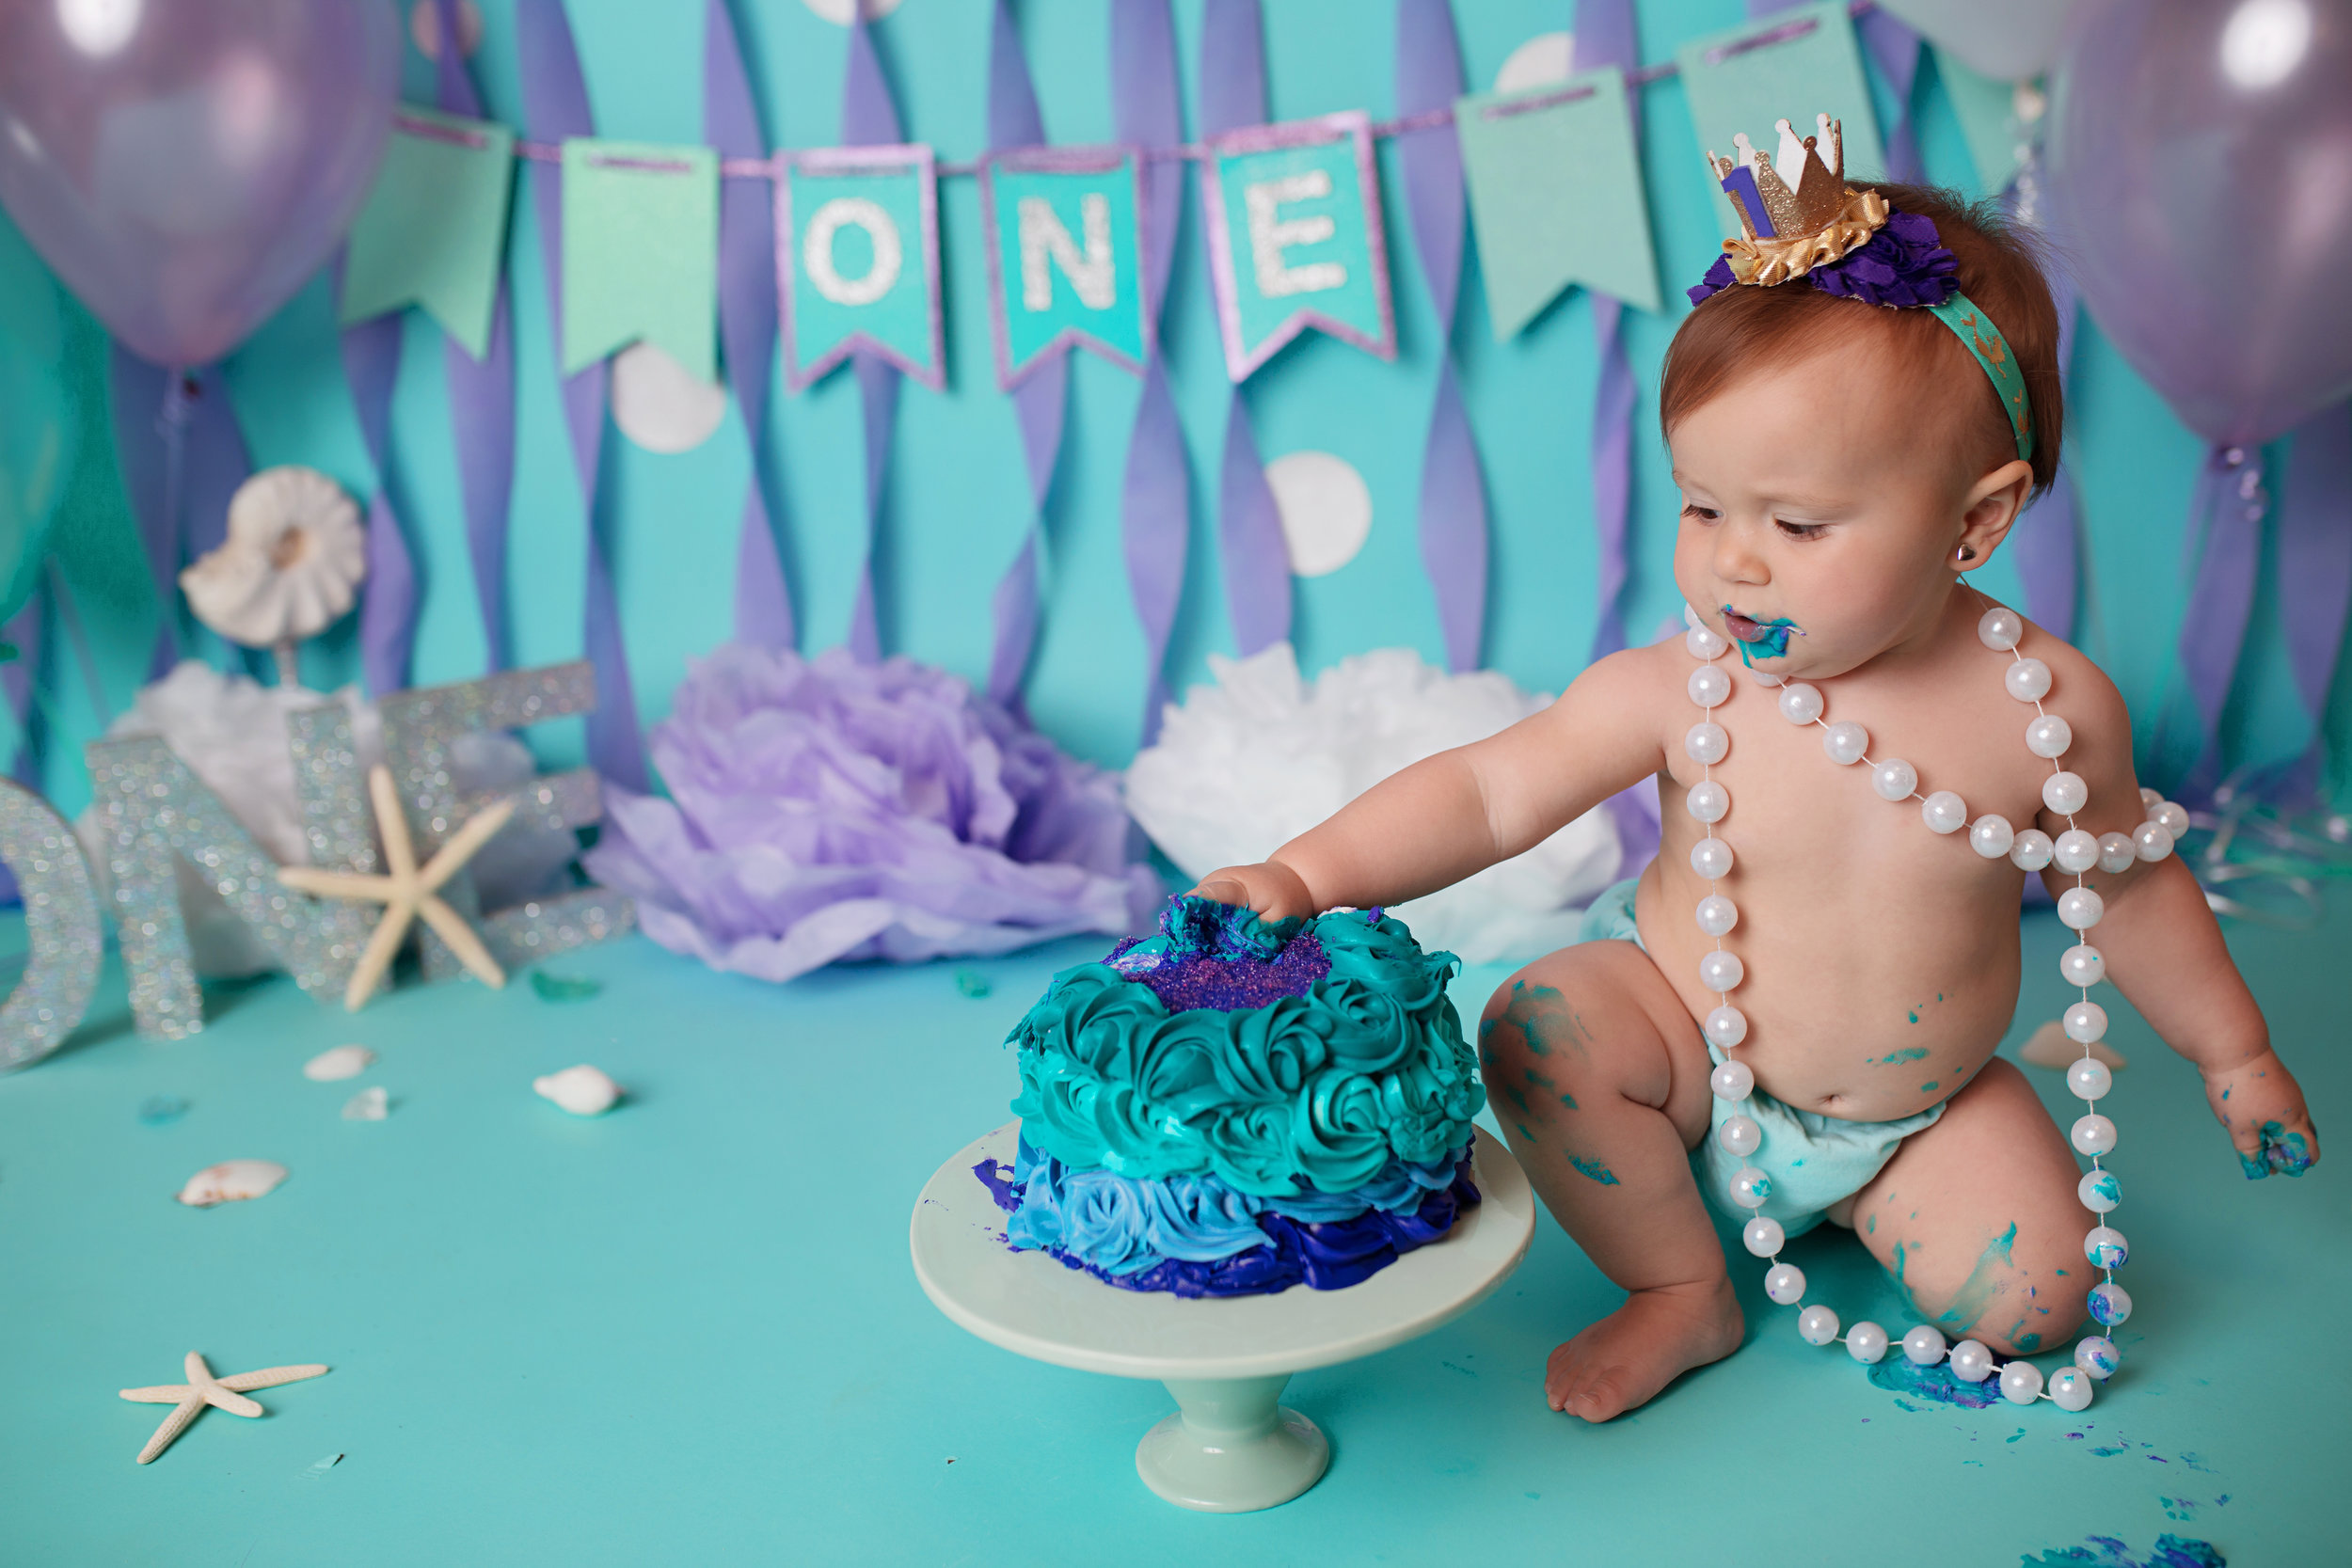 anchorage-cake-smash-photography-9.jpg